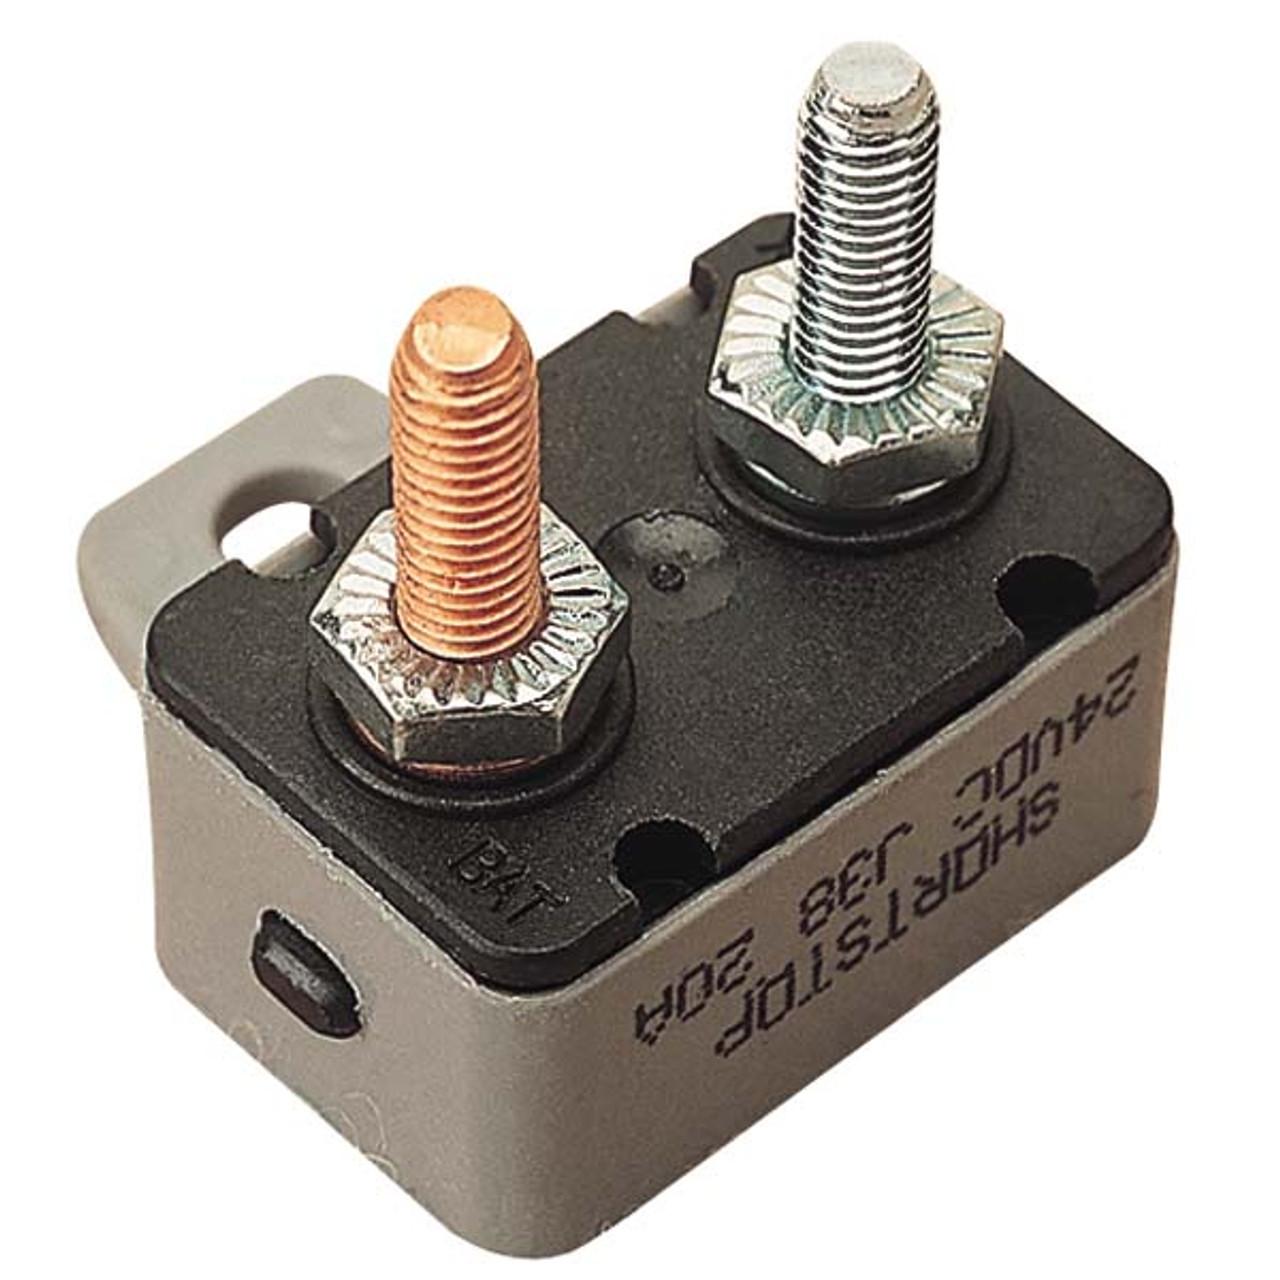 sea dog resettable circuit breakers marine fusesSeadog Resettable Circuit Breaker High Amp Surface Mount #4